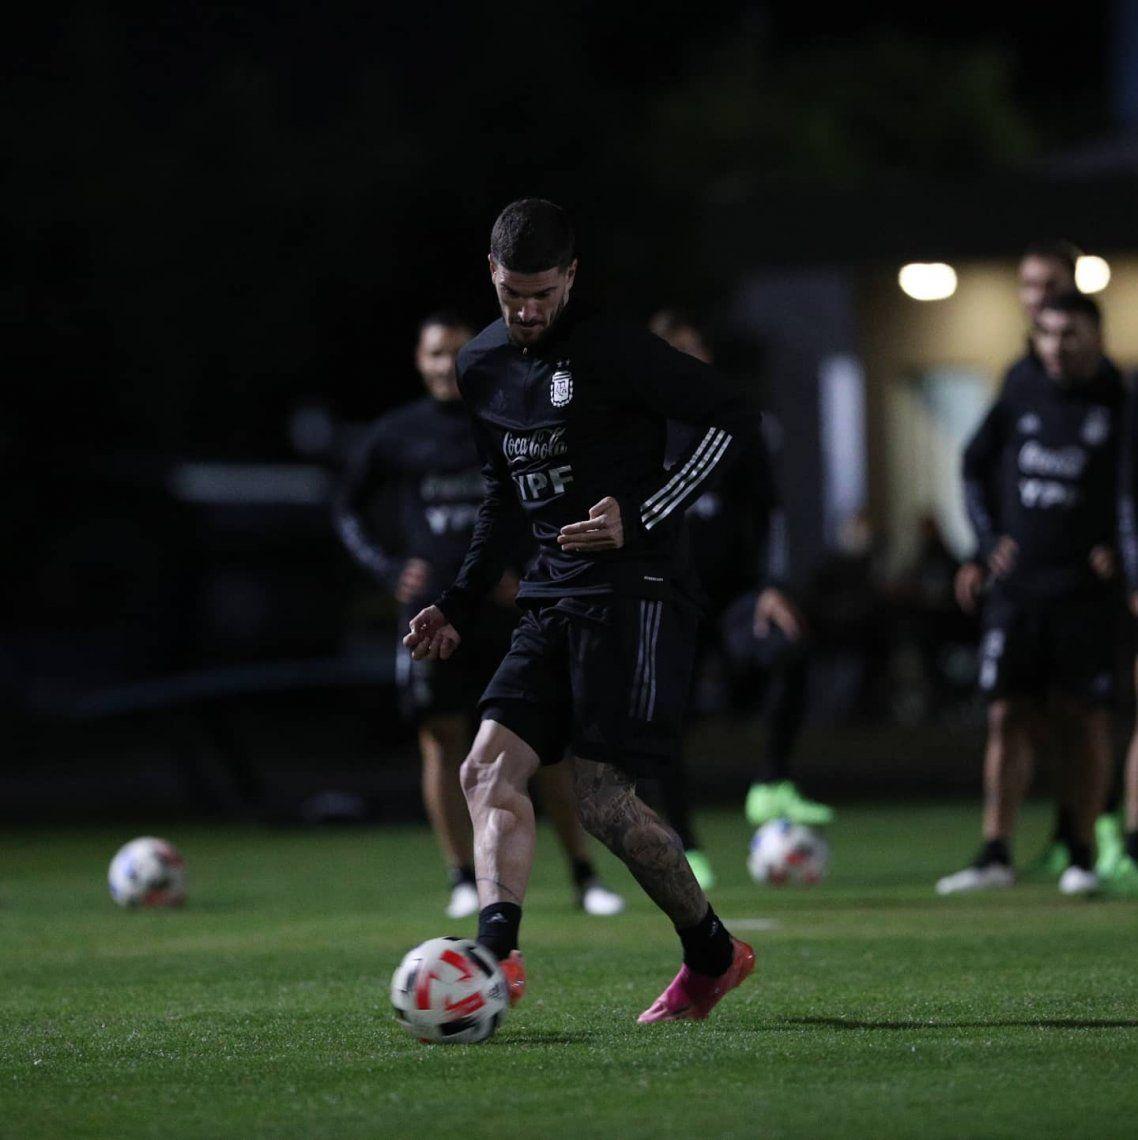 La Selección Argentina se prepara para enfrentar a Chile